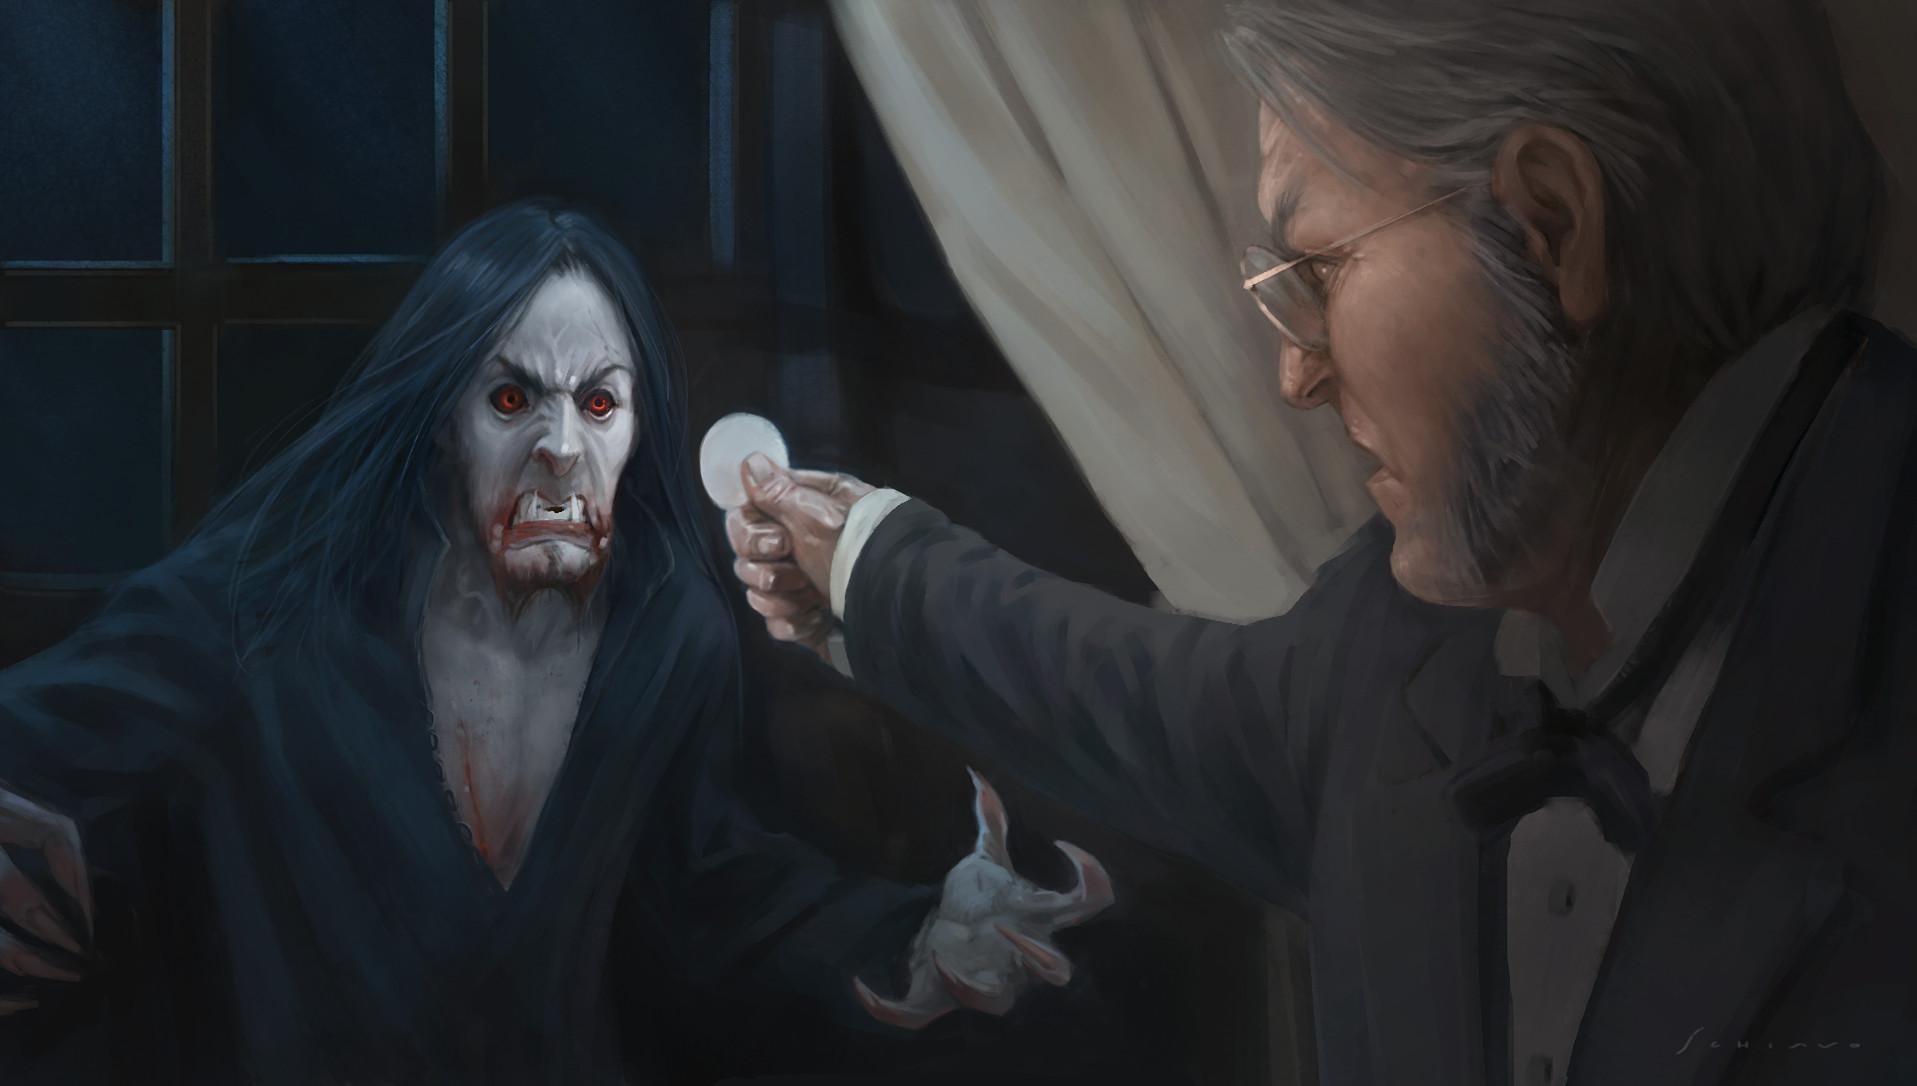 Dracula and Van Helsing | Jacopo Schiavo | Horror ...